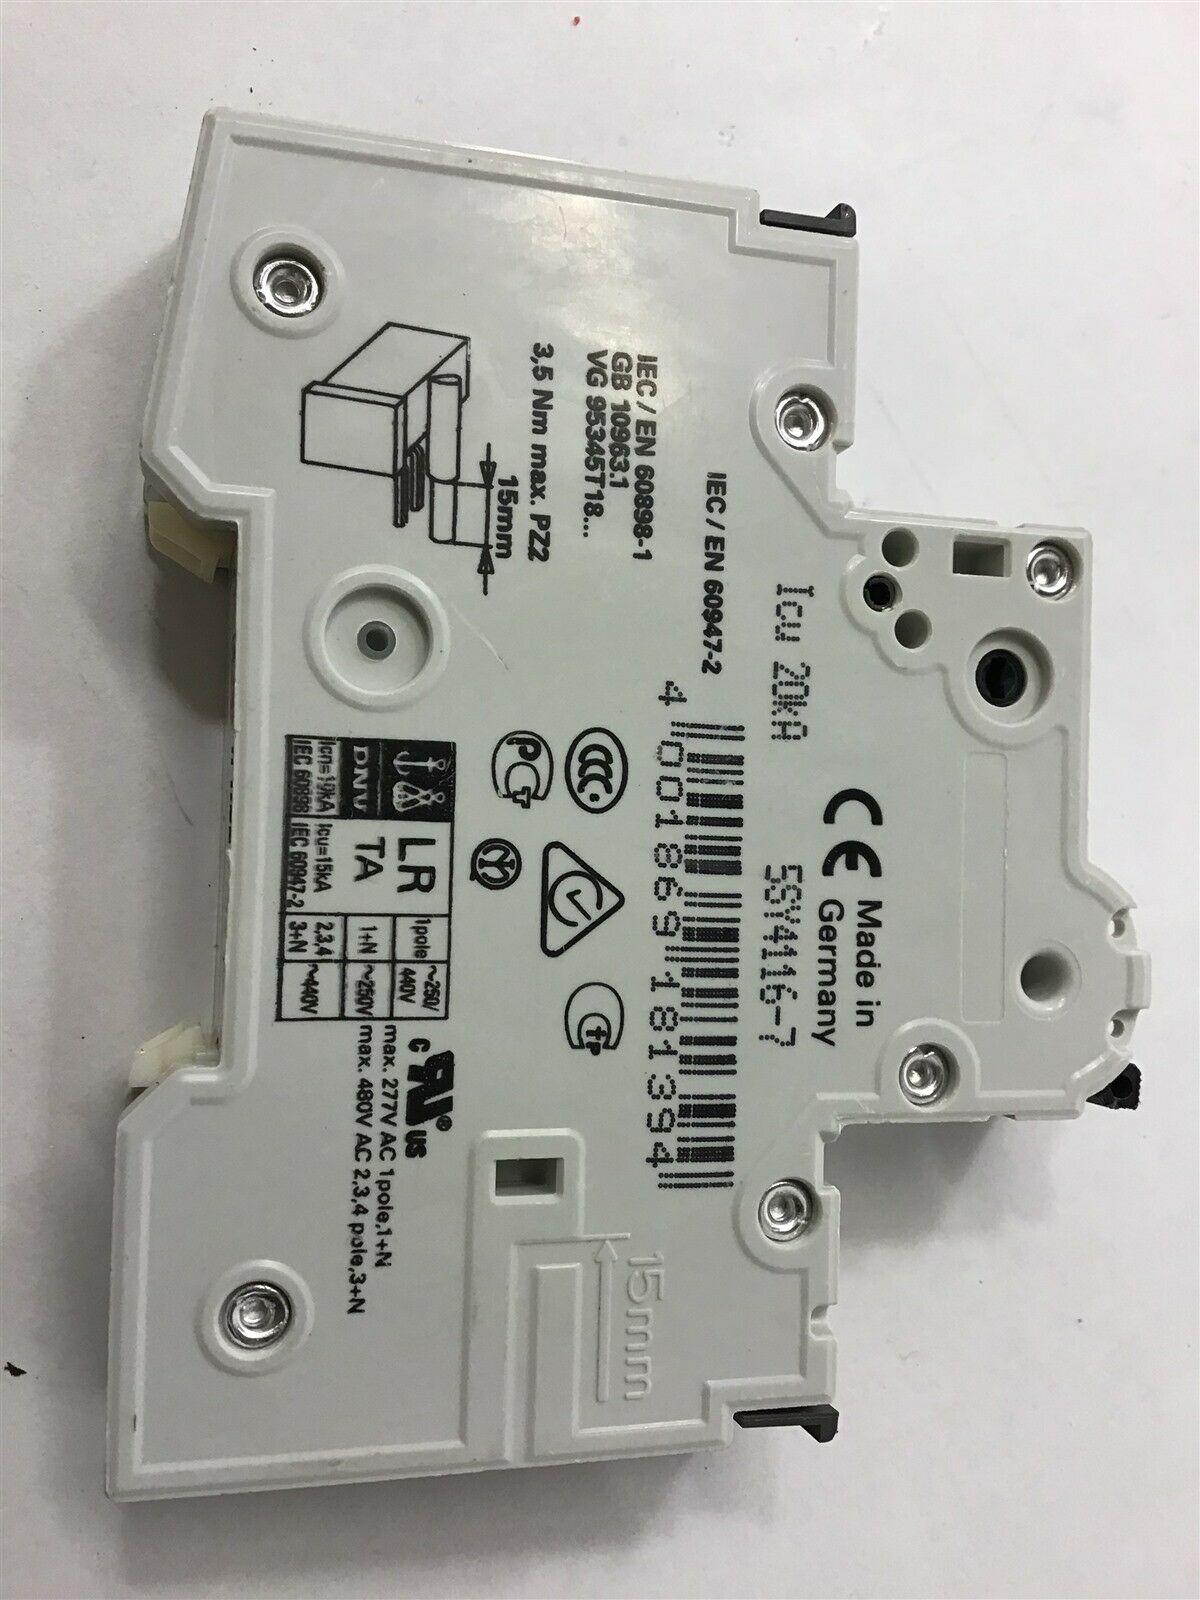 1 Circuit Breaker Siemens 5SSN1 B16A 1 pin used